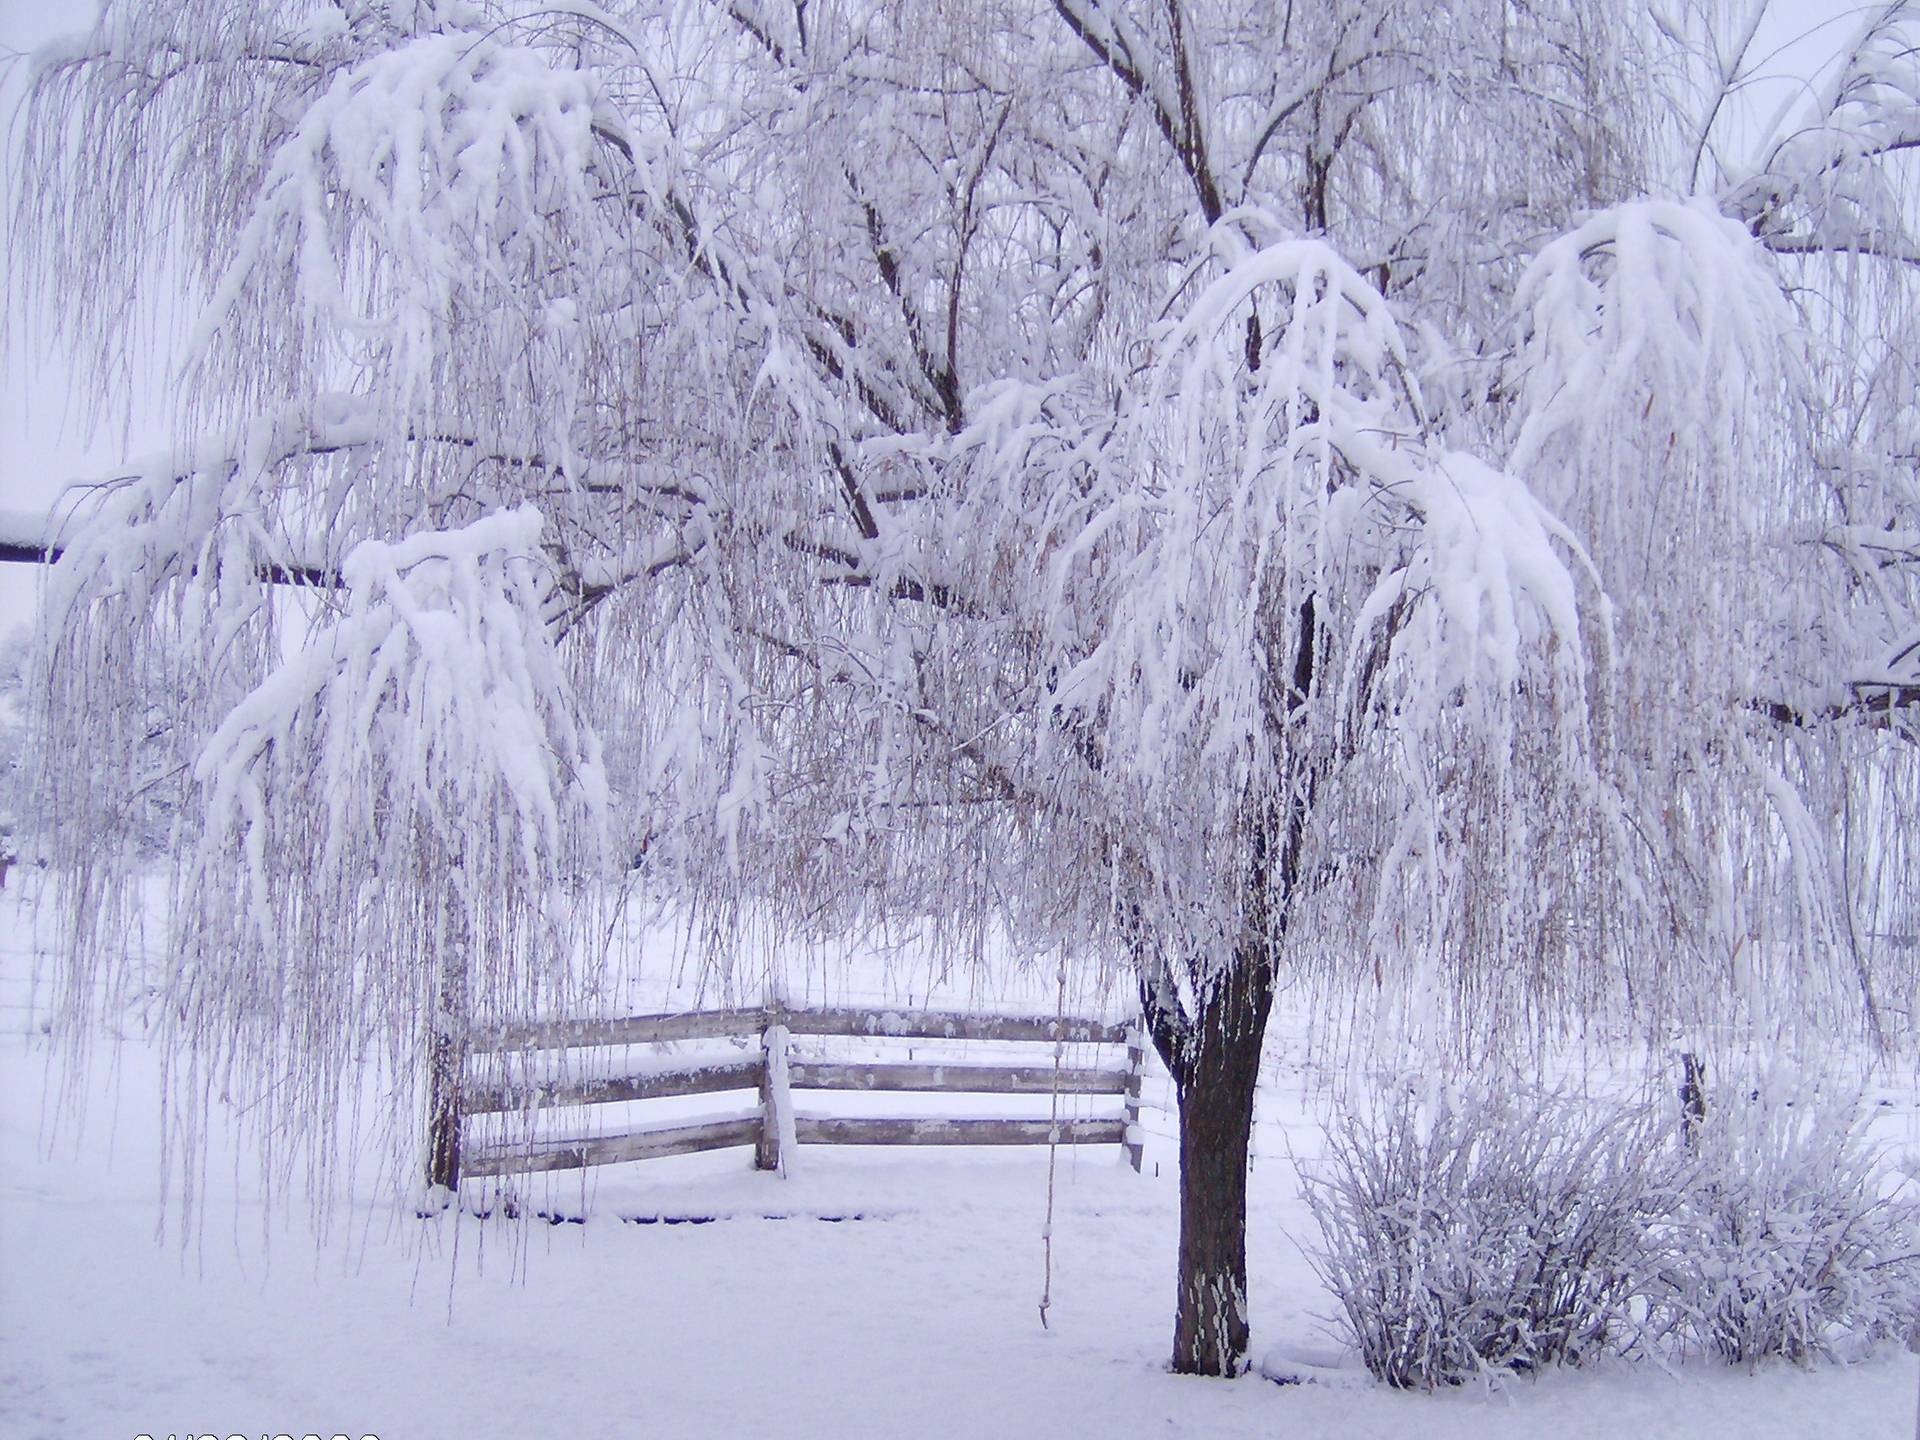 Free Winter Desktop Wallpaper Downloads, wallpaper, Free Winter .